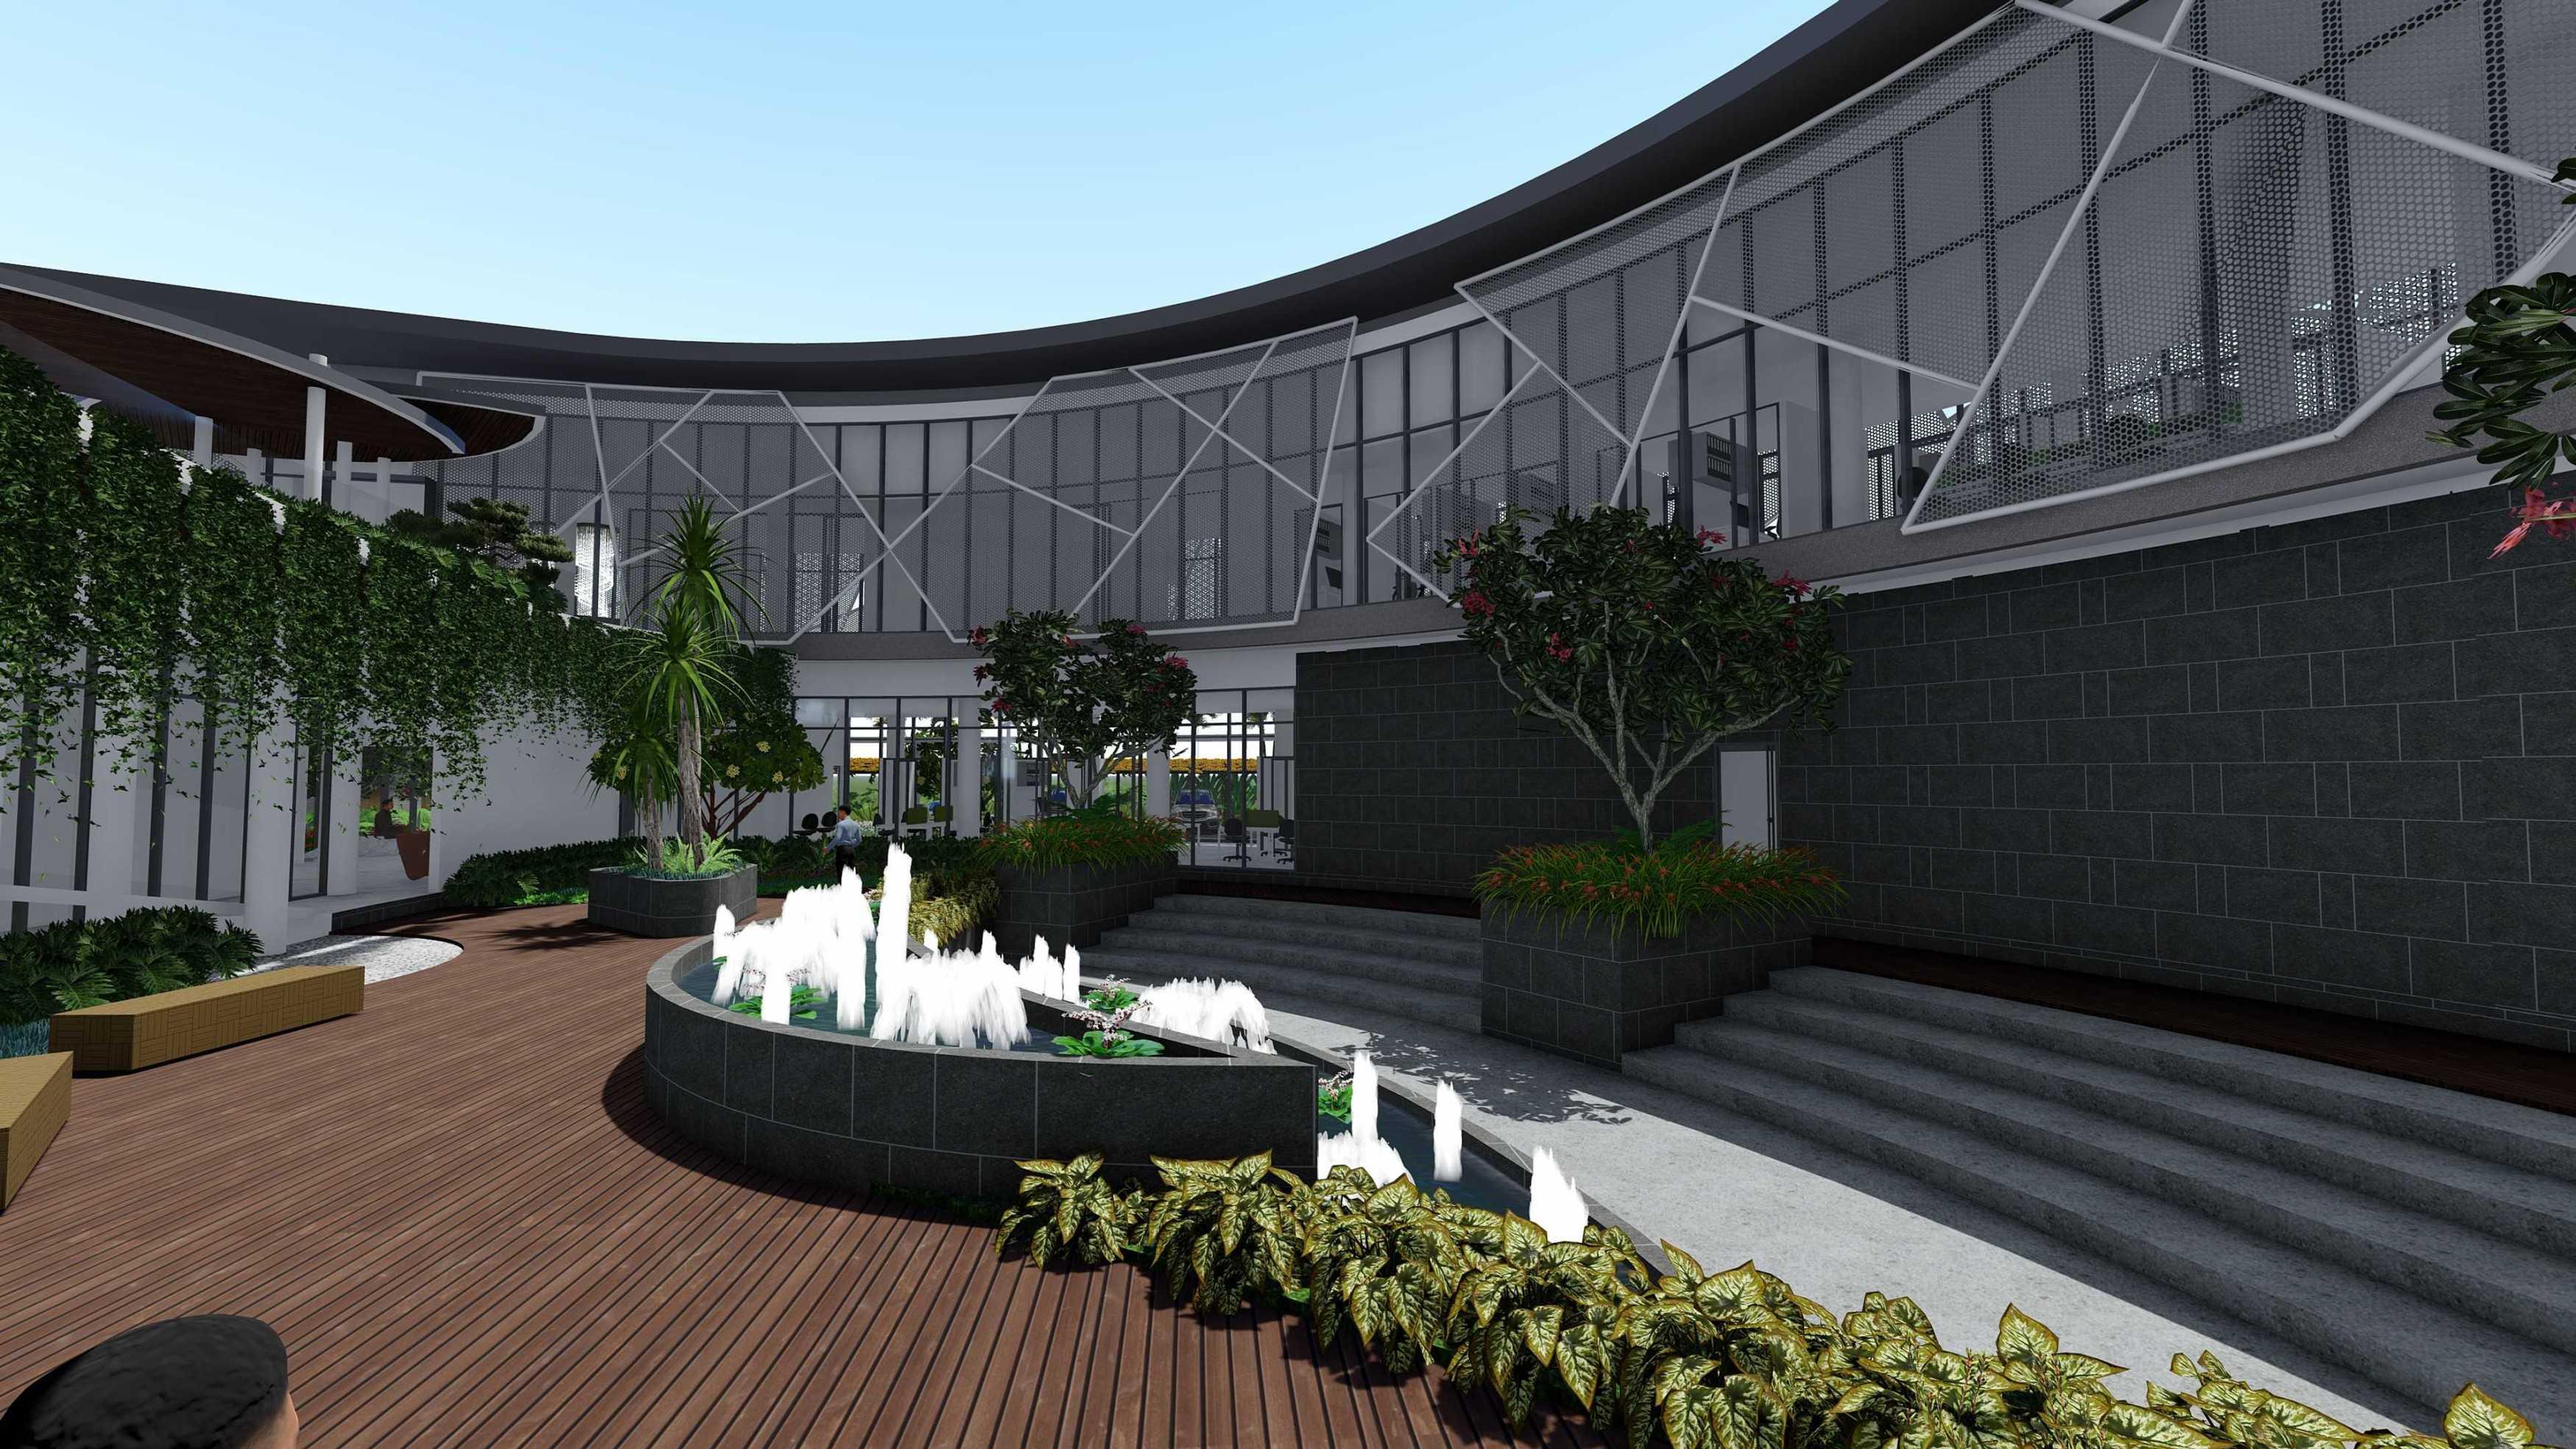 Raaj Gill Arsitek Aari Office Building & Laboratory #1 Pekanbaru, Kota Pekanbaru, Riau, Indonesia Pekanbaru, Kota Pekanbaru, Riau, Indonesia Raaj-Gill-Arsitek-Aari-Office-Building-Laboratory   74693